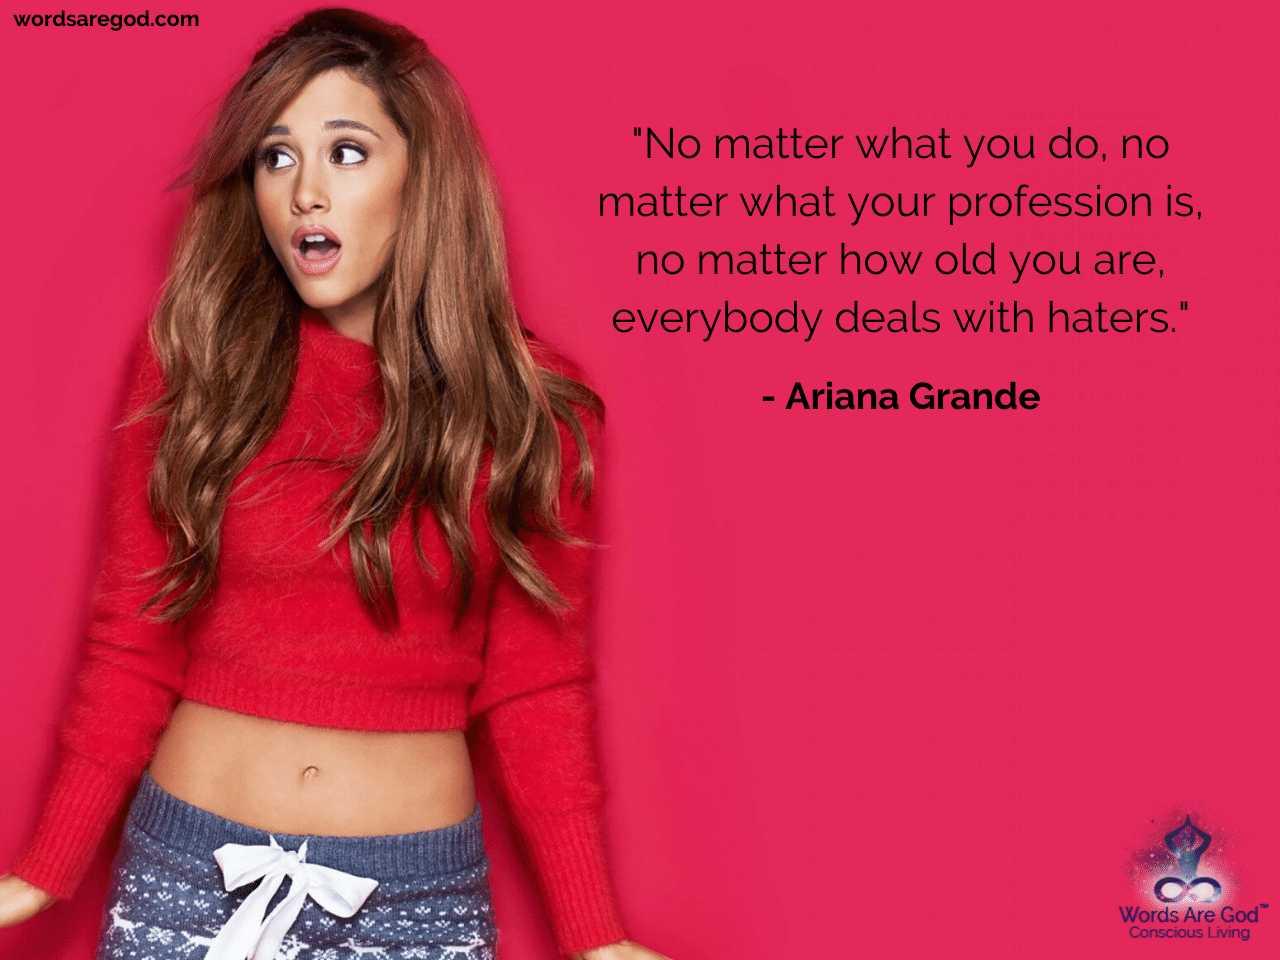 Ariana Grande Best Quote by Ariana Grande